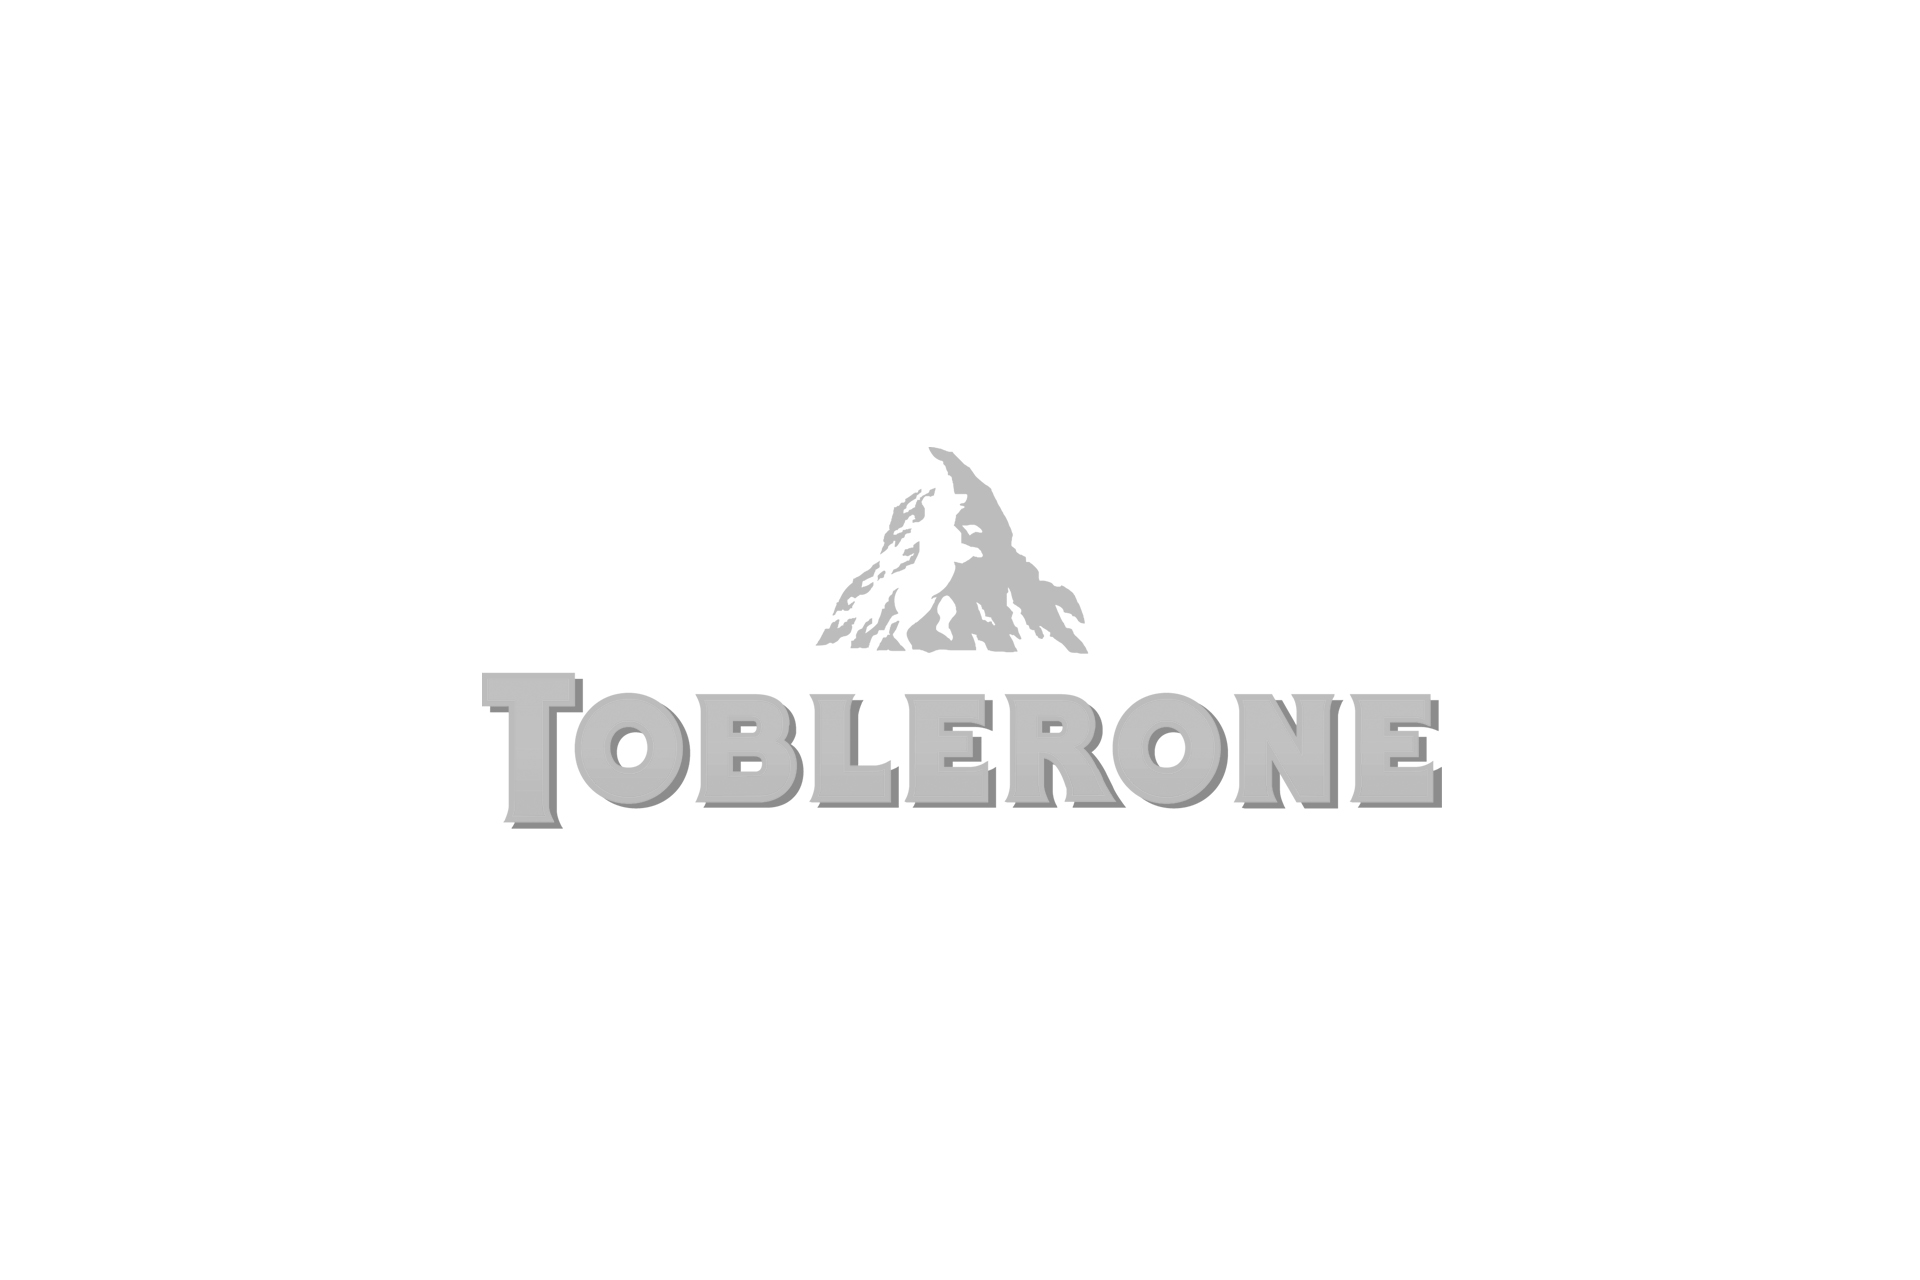 toblerone logo grey